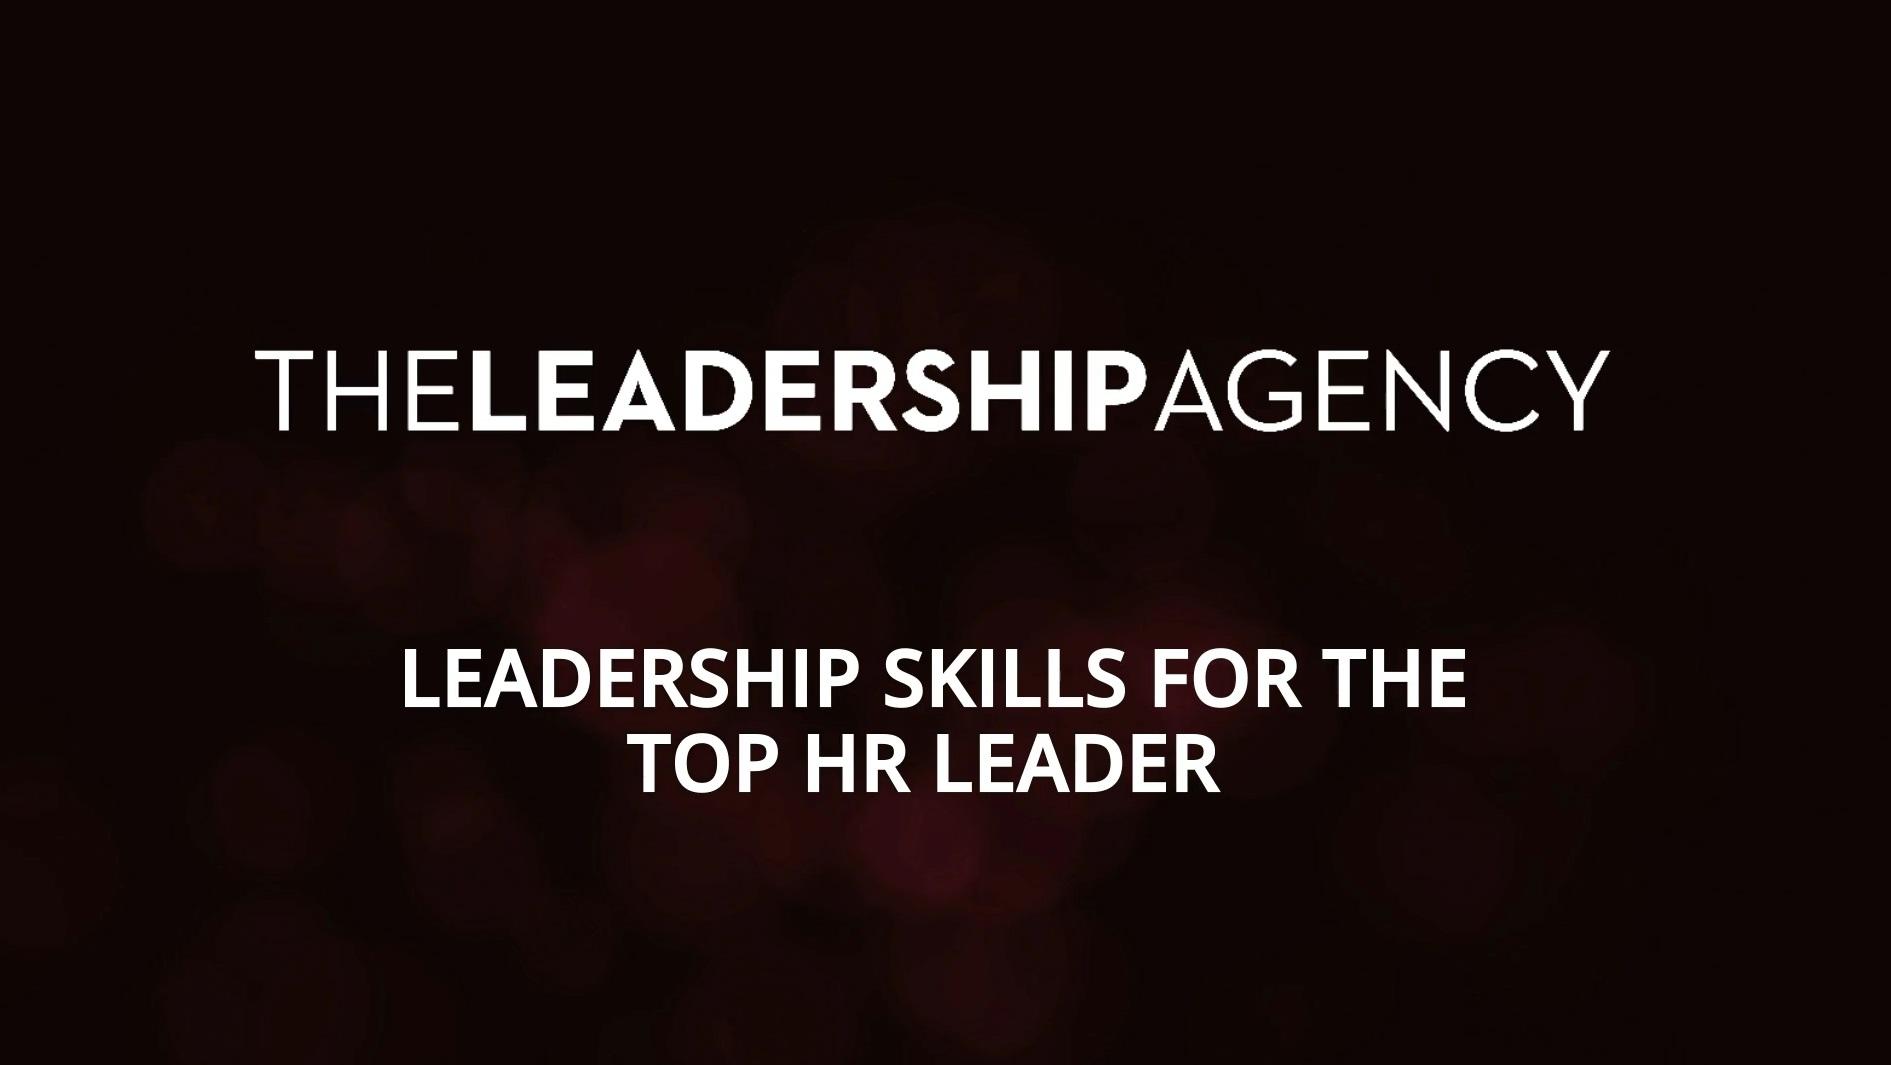 Leadership skills for the top HR leader